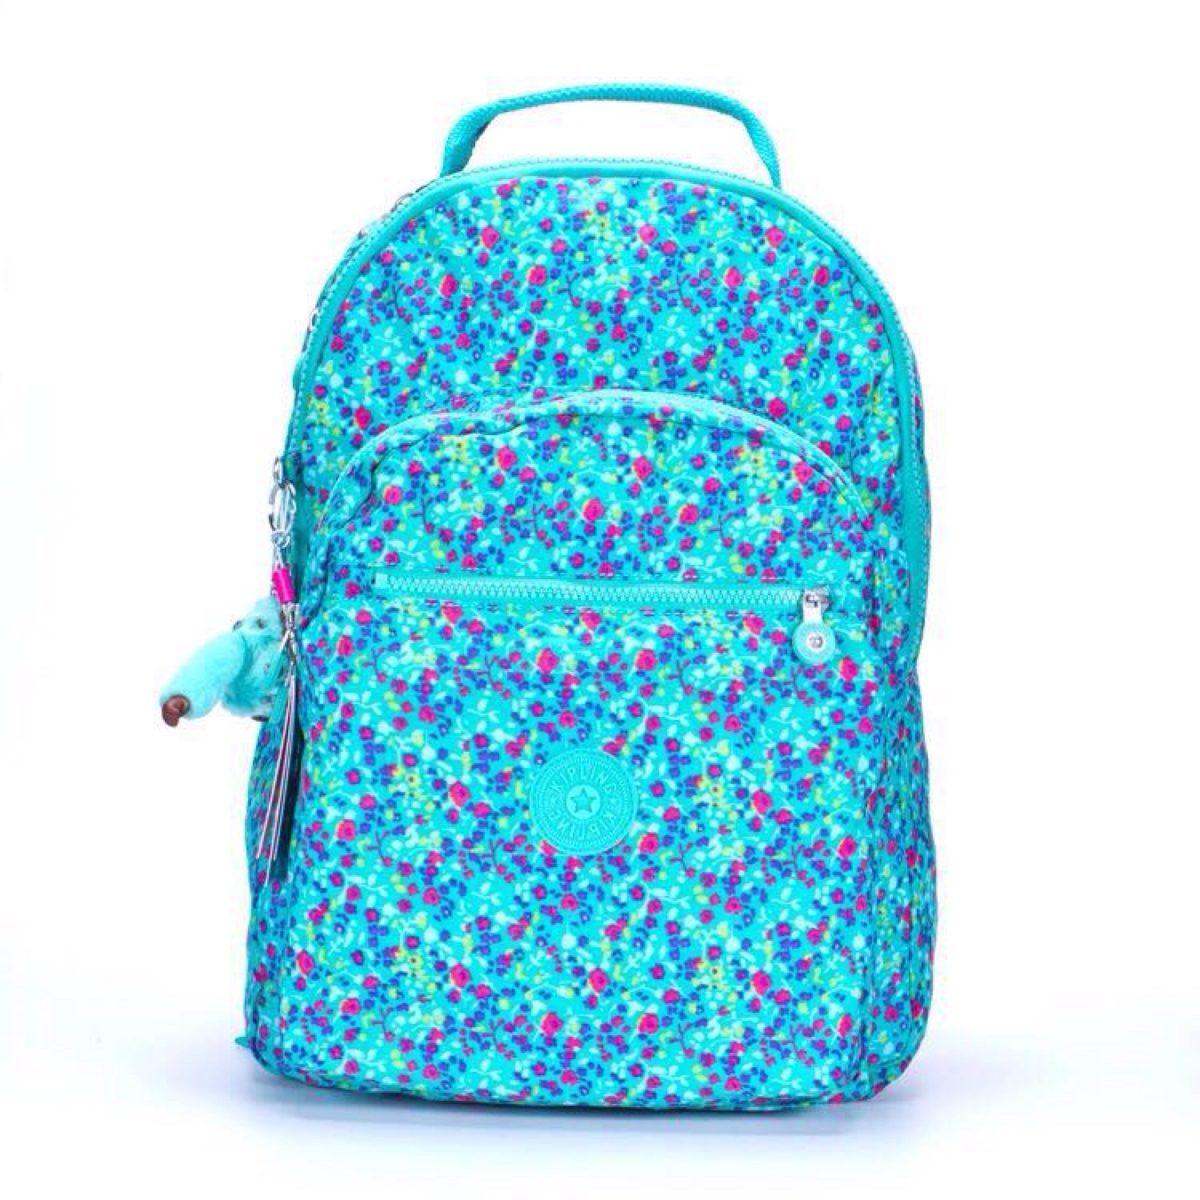 mochila da kipling   Mochilas Kipling Variadas - R  499,99 em Mercado Livre be59776a5c